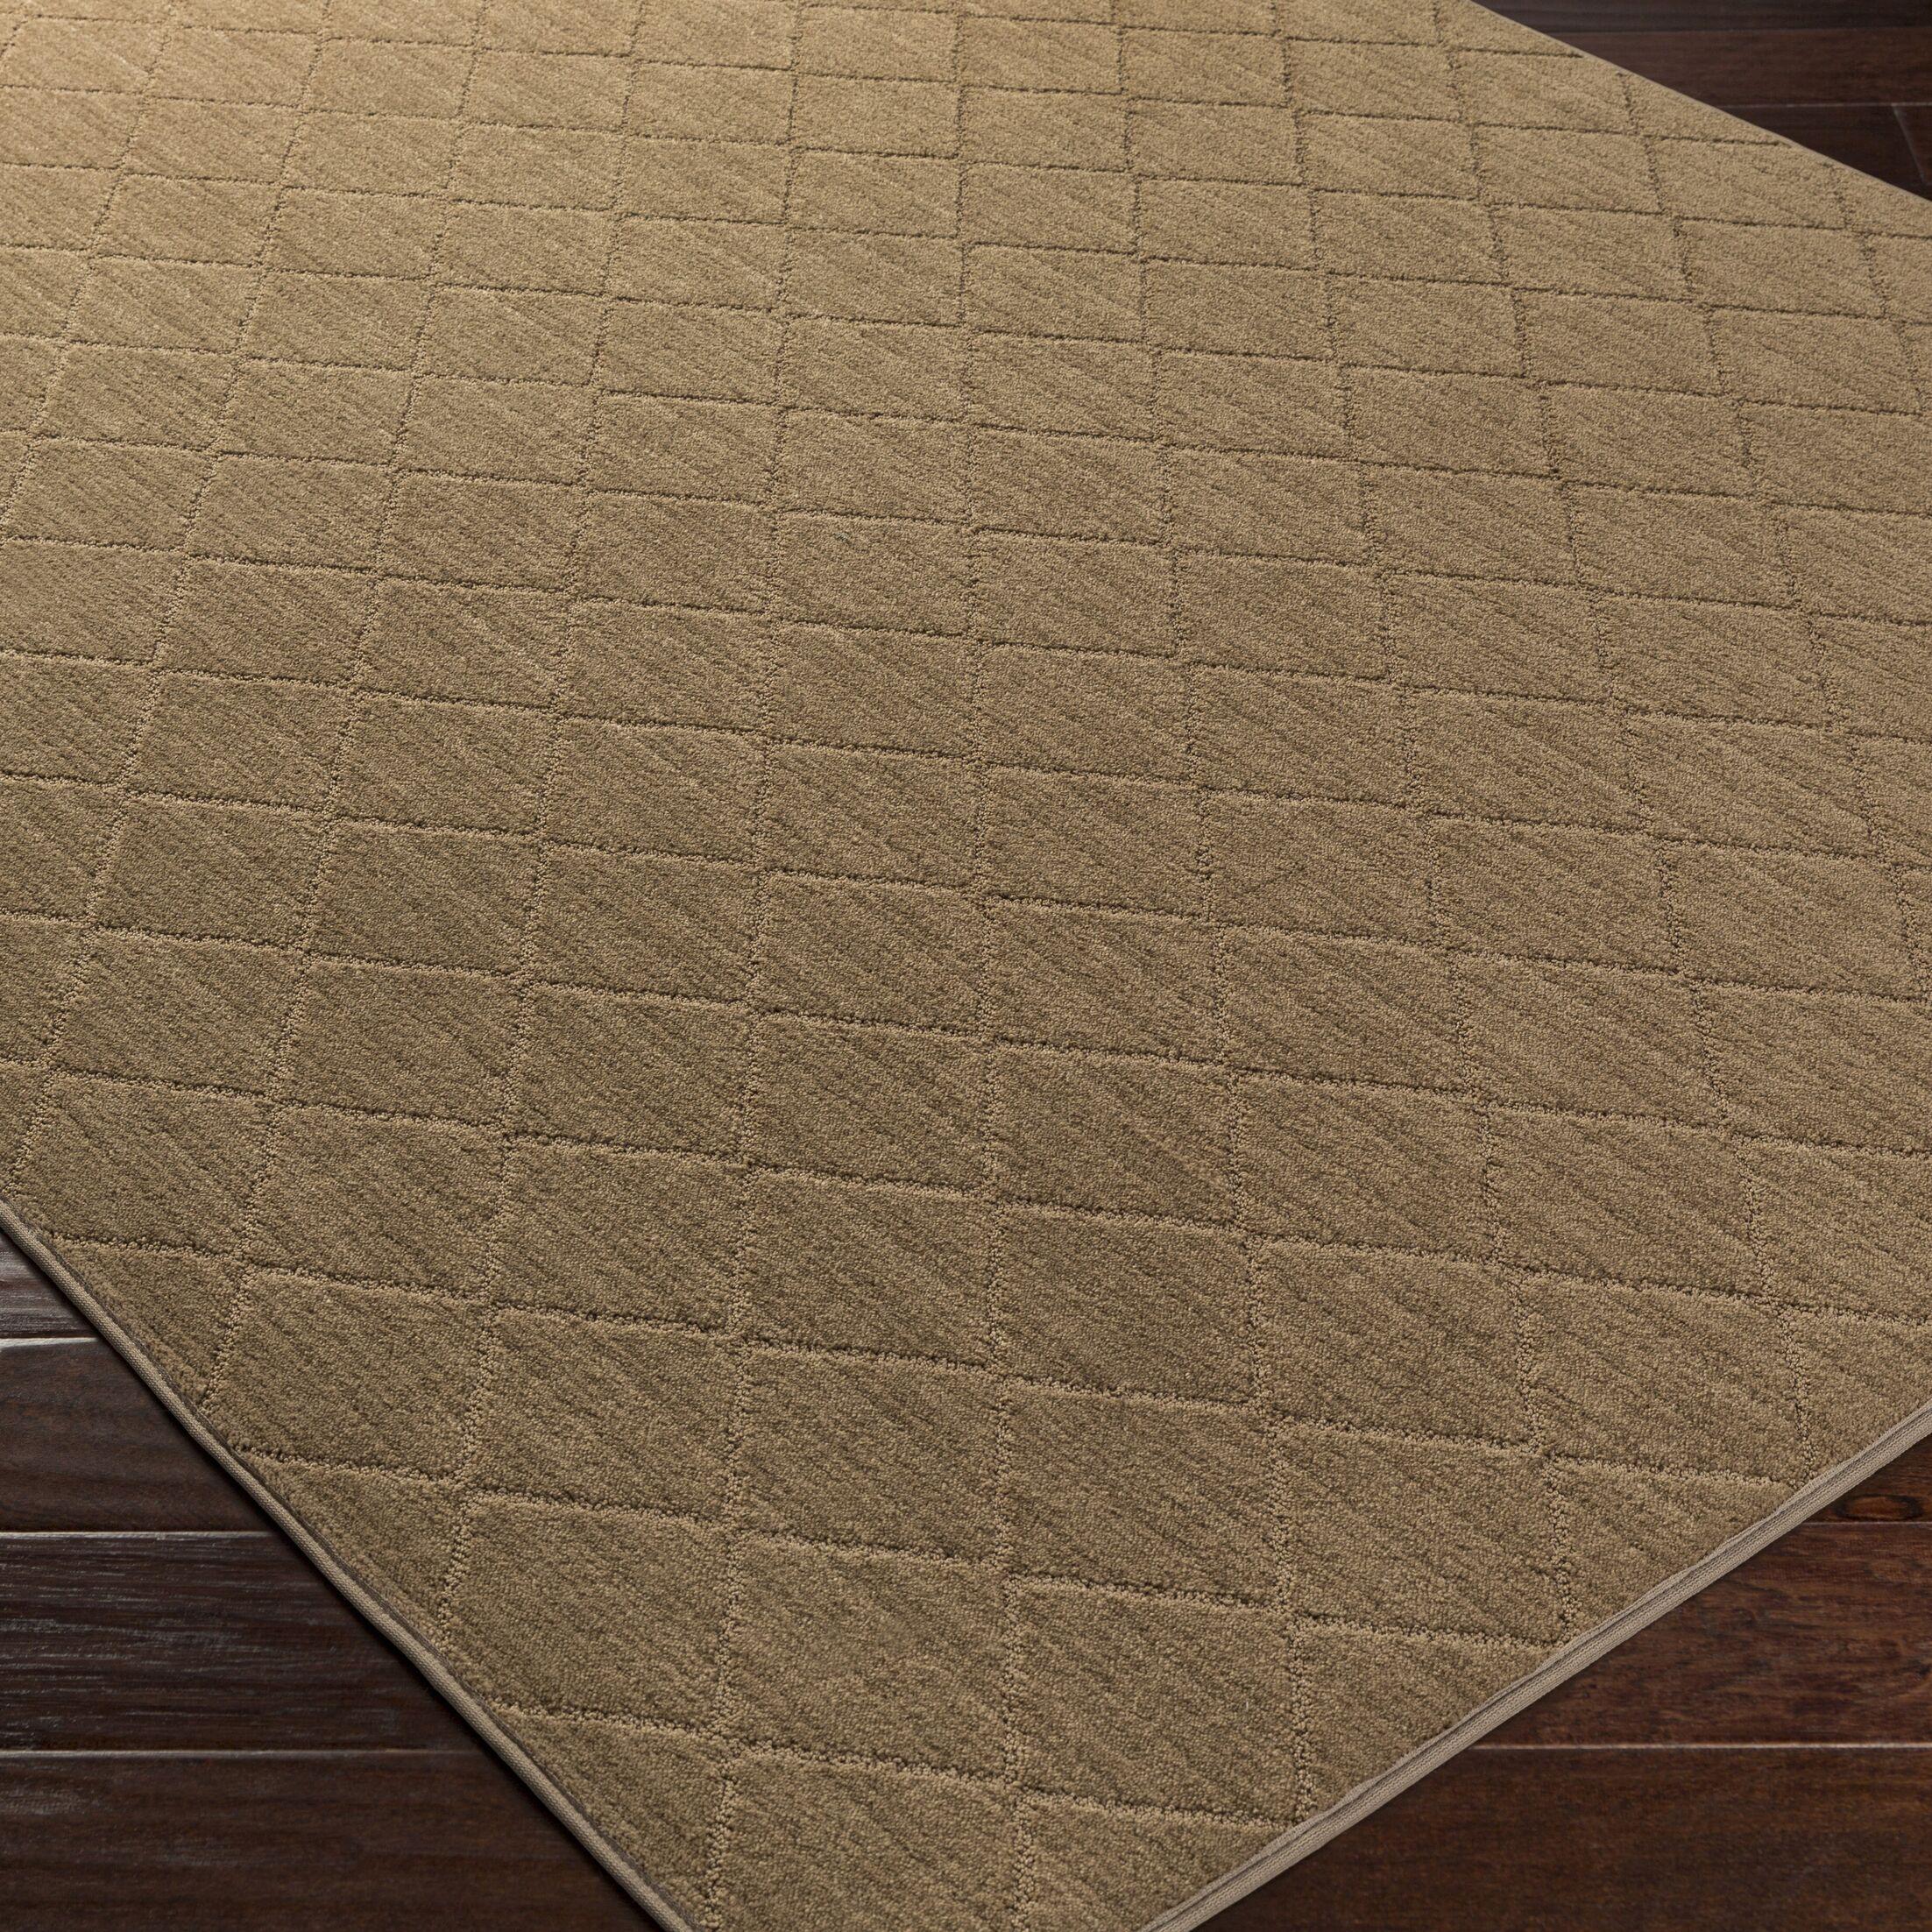 Huxley Beige Area Rug Rug Size: Rectangle 4' x 6'